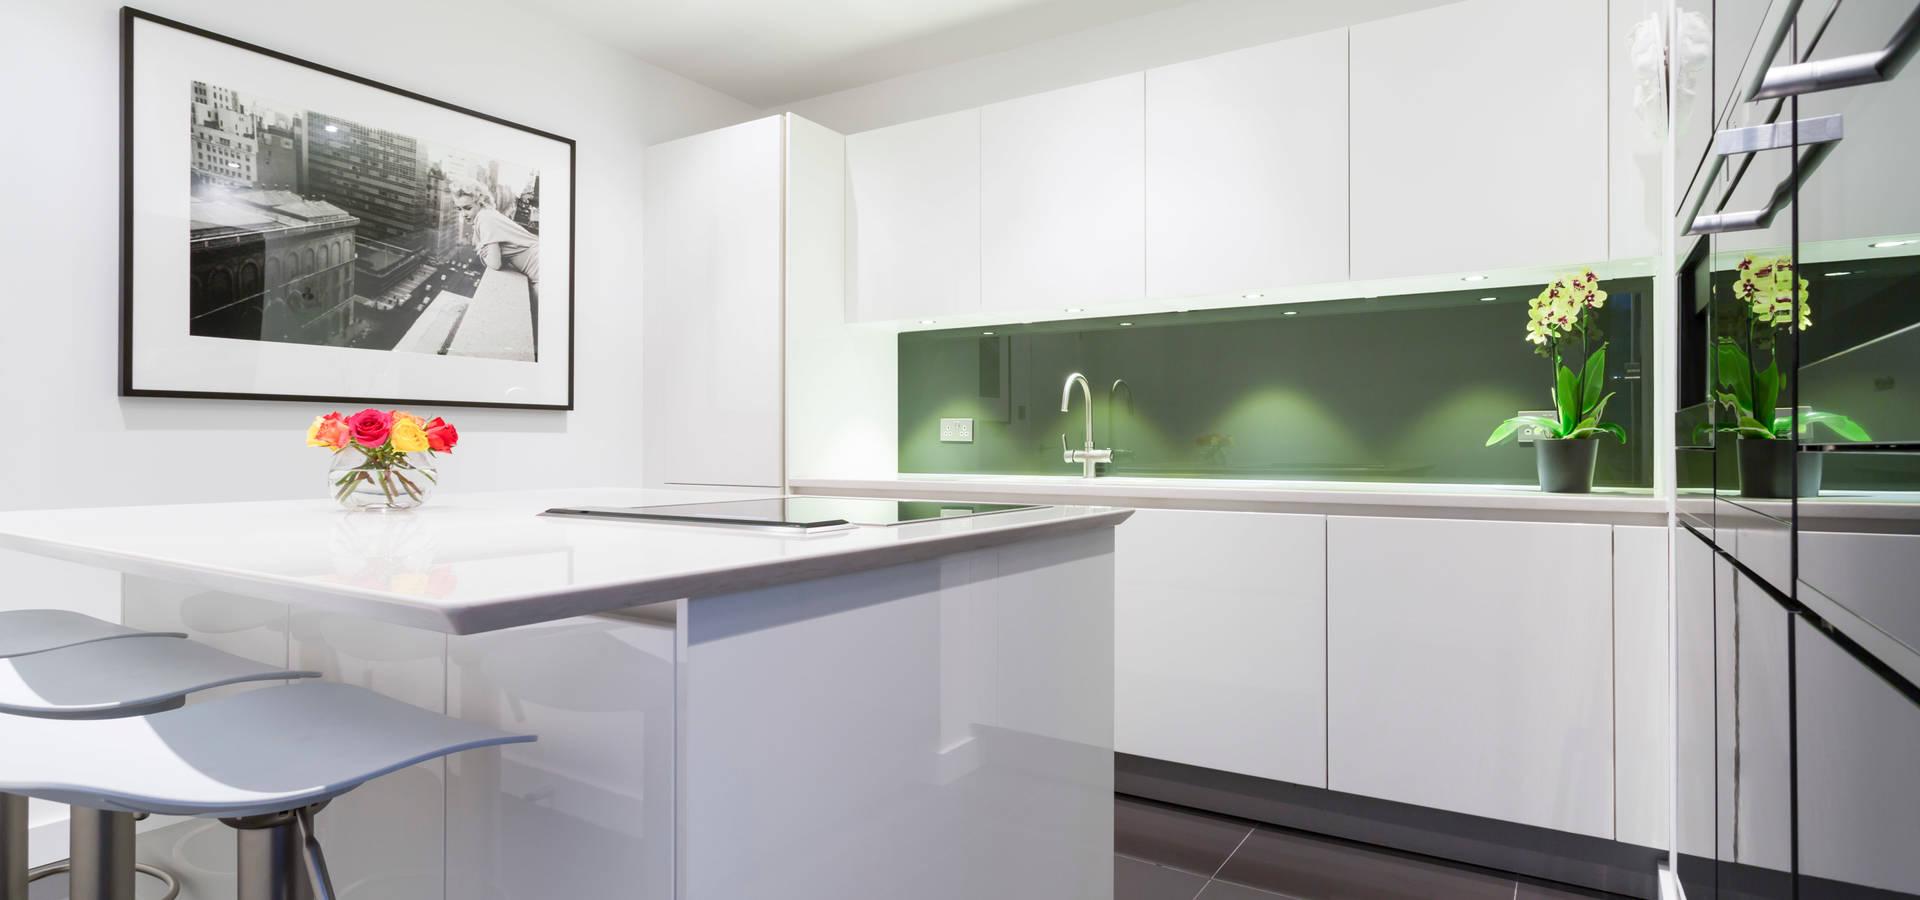 LWK Kitchens